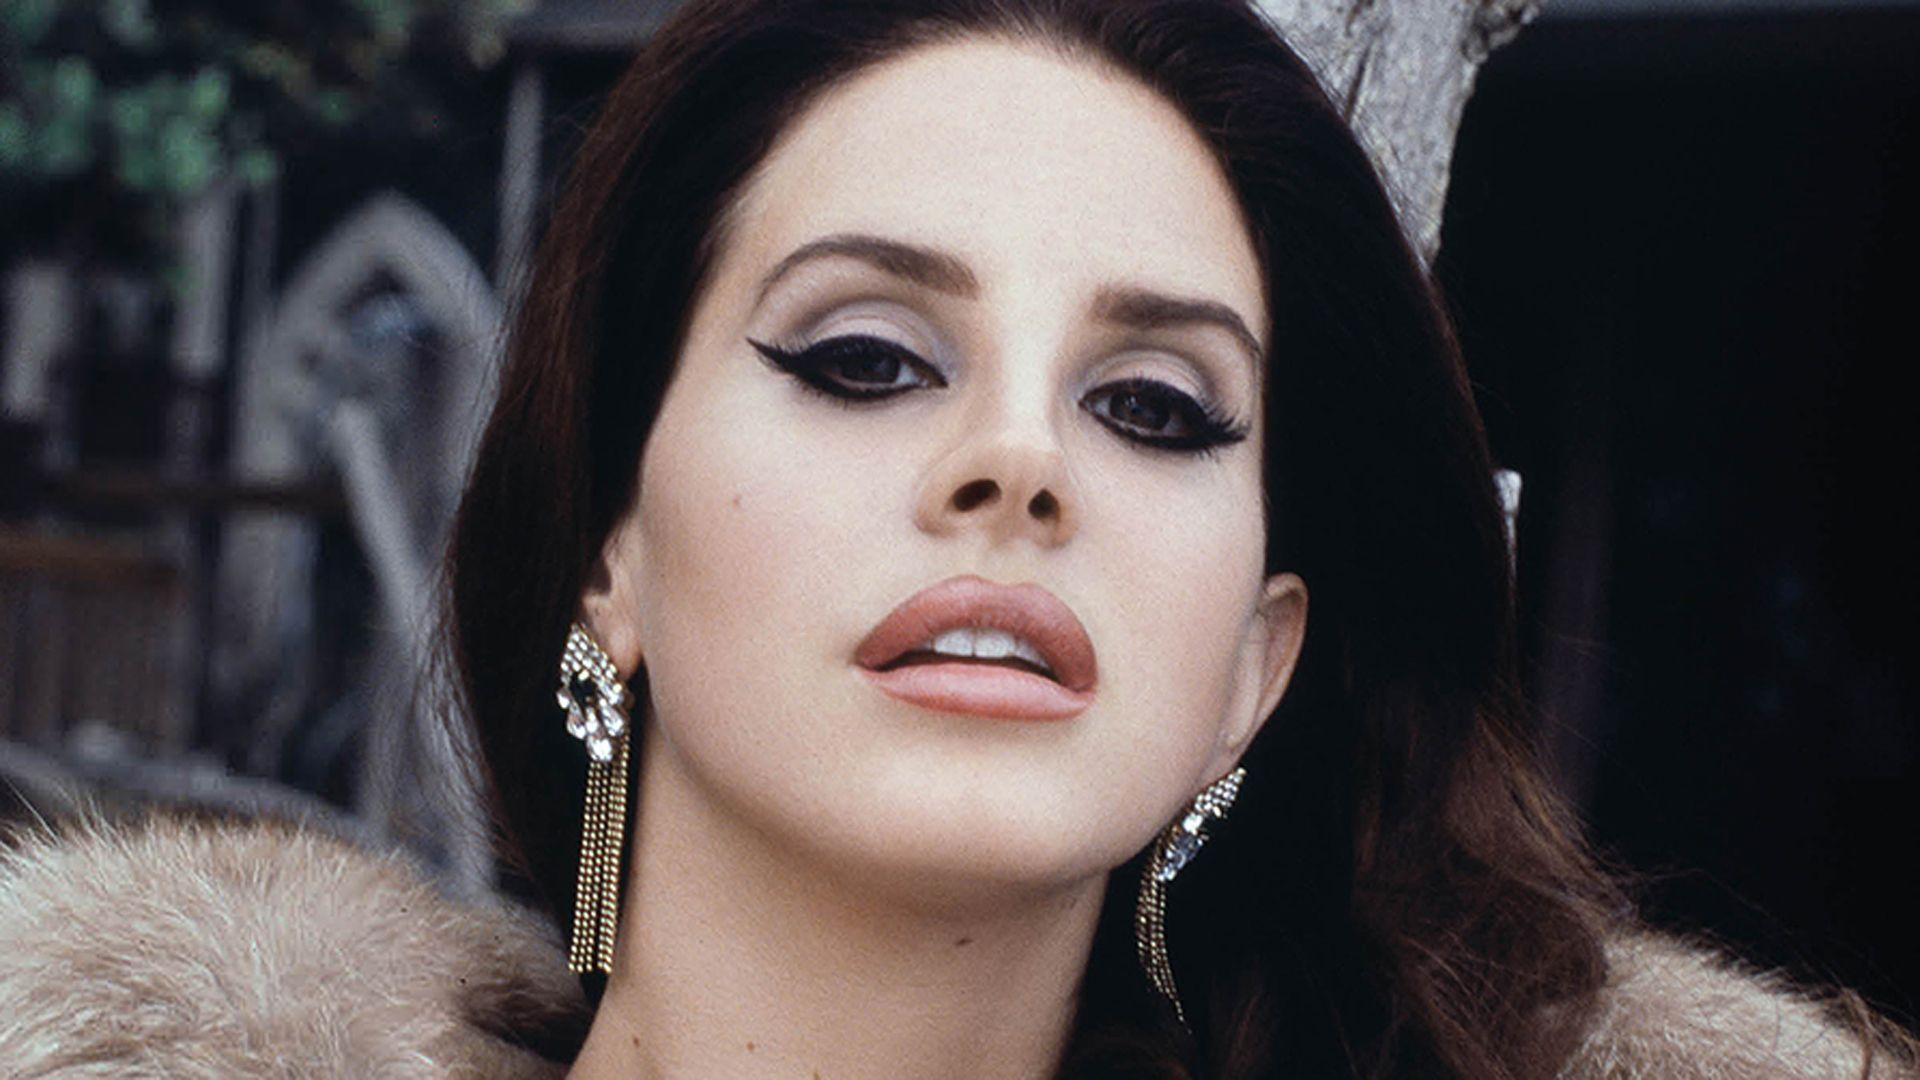 Lana Del Rey Pics - CelebrityWallpapersHQ.Com